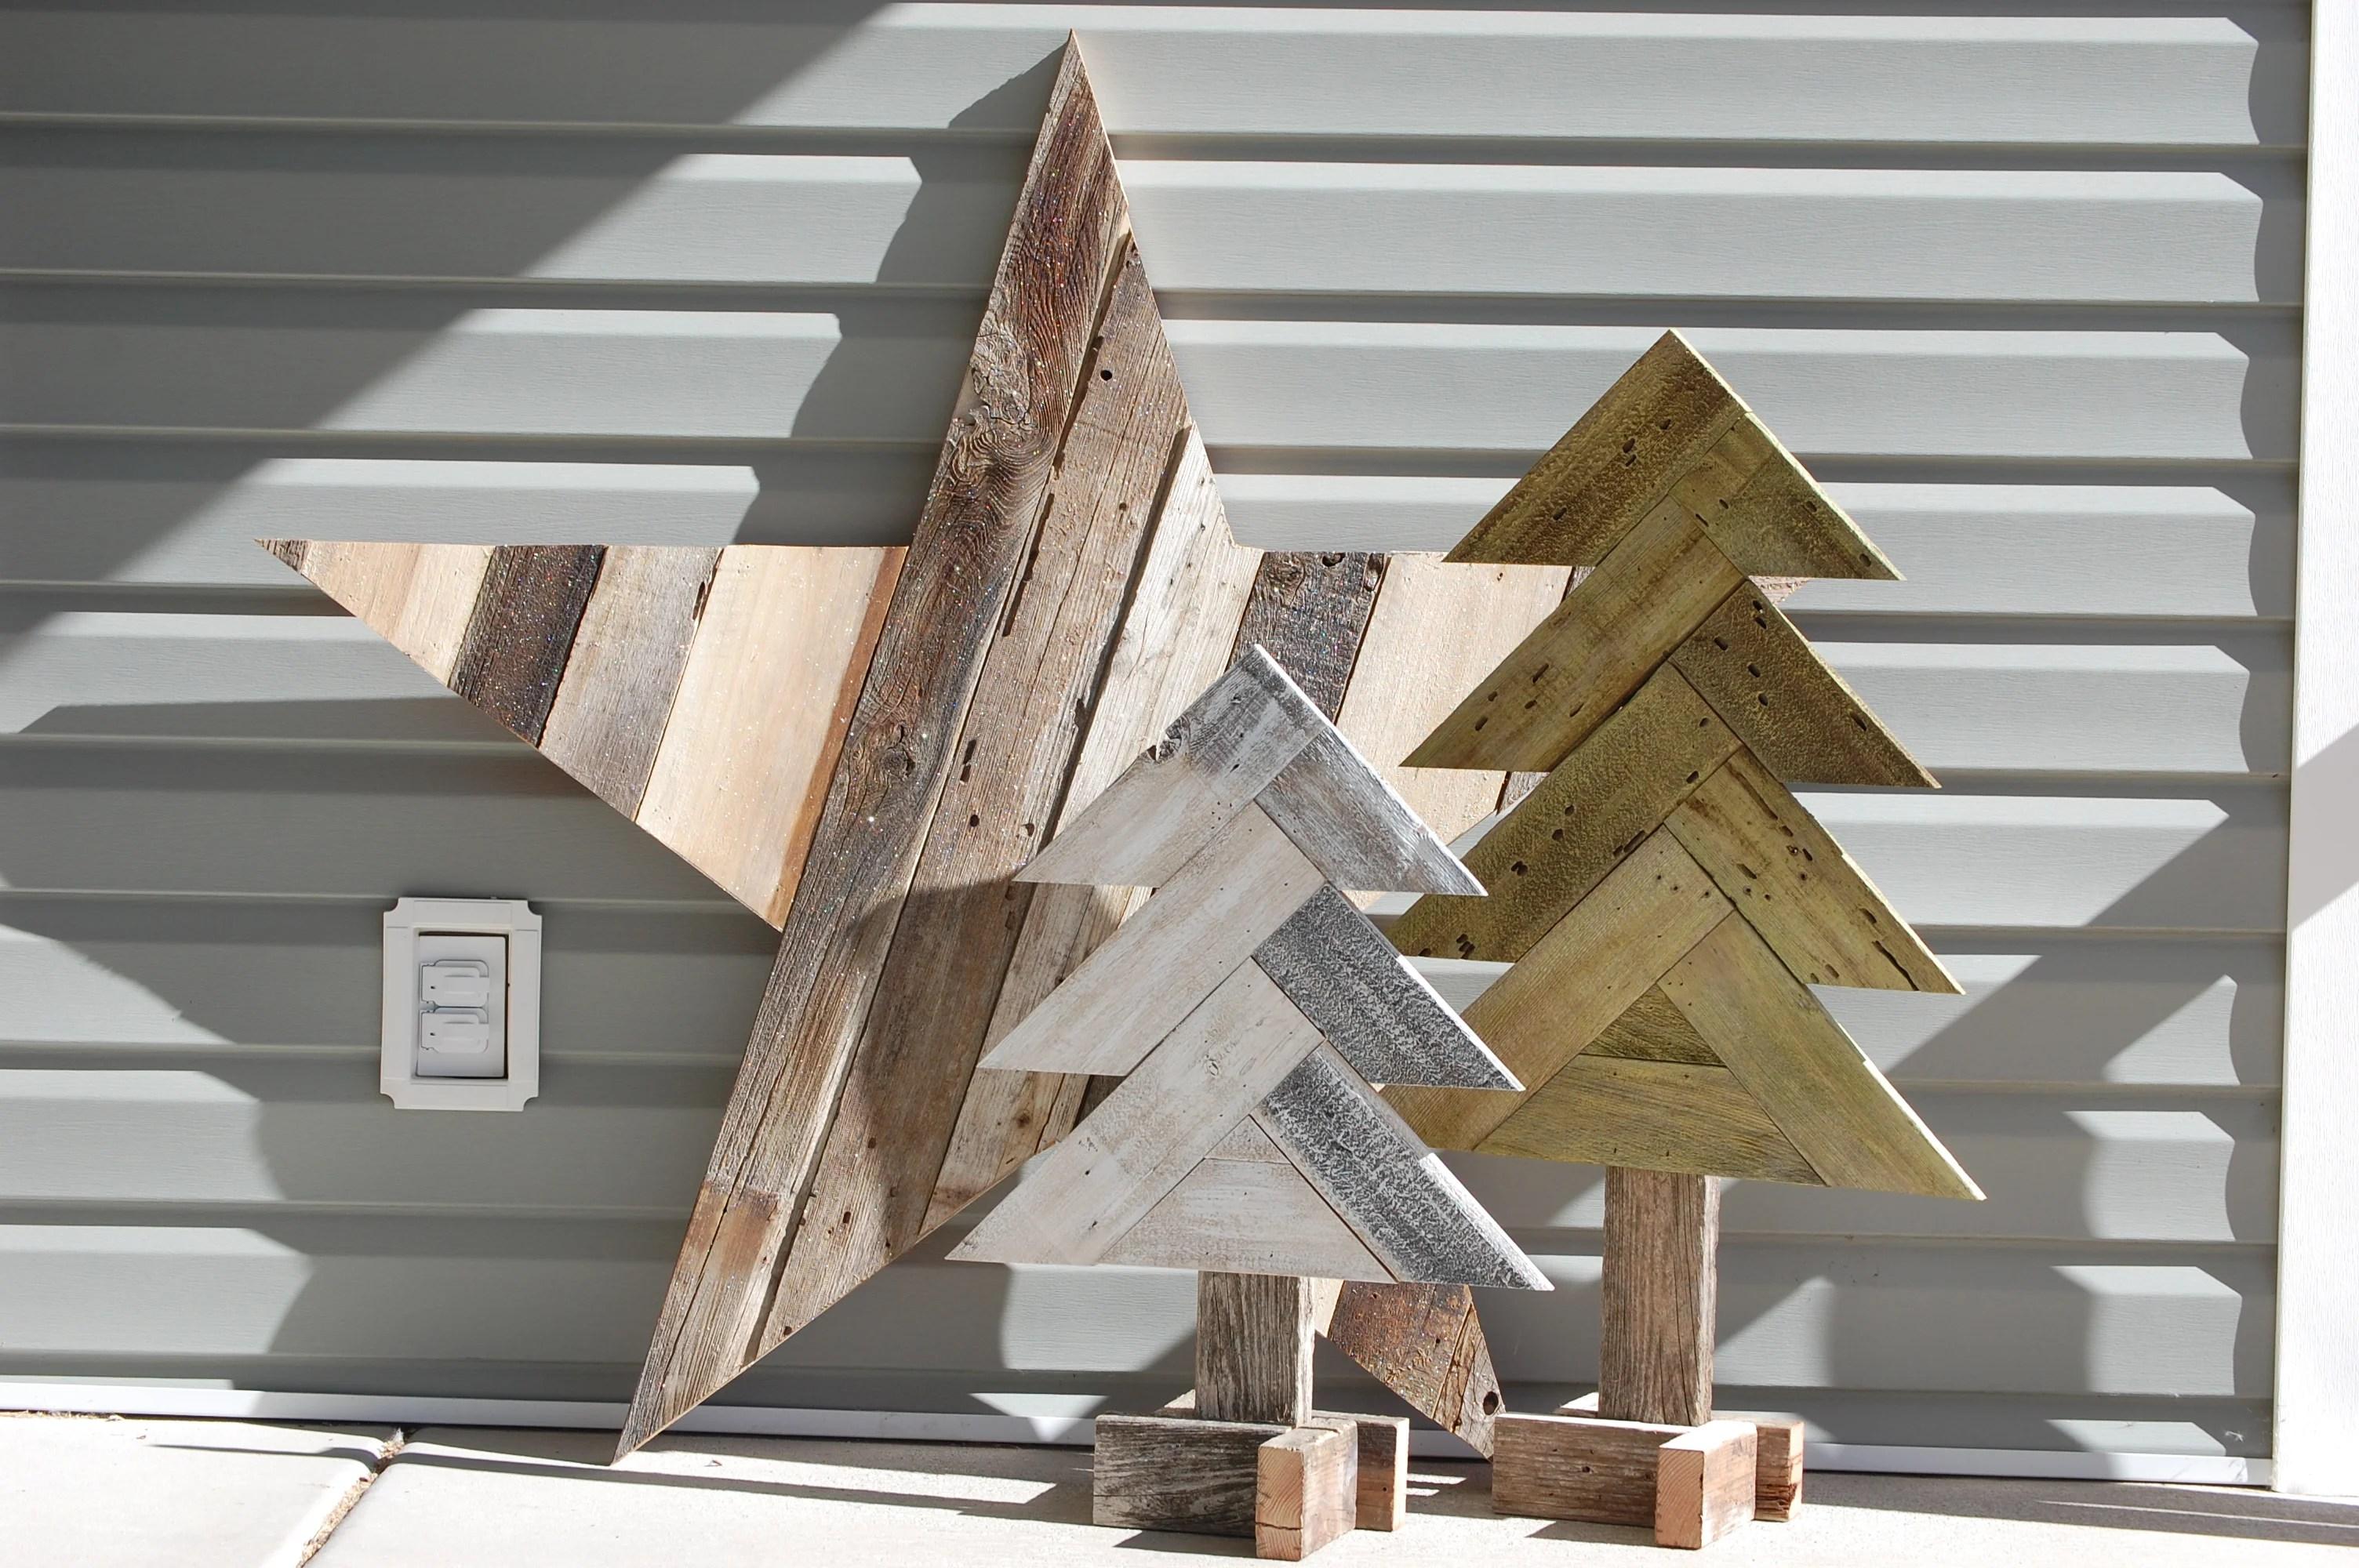 Yard Art Wooden Pallet Projects